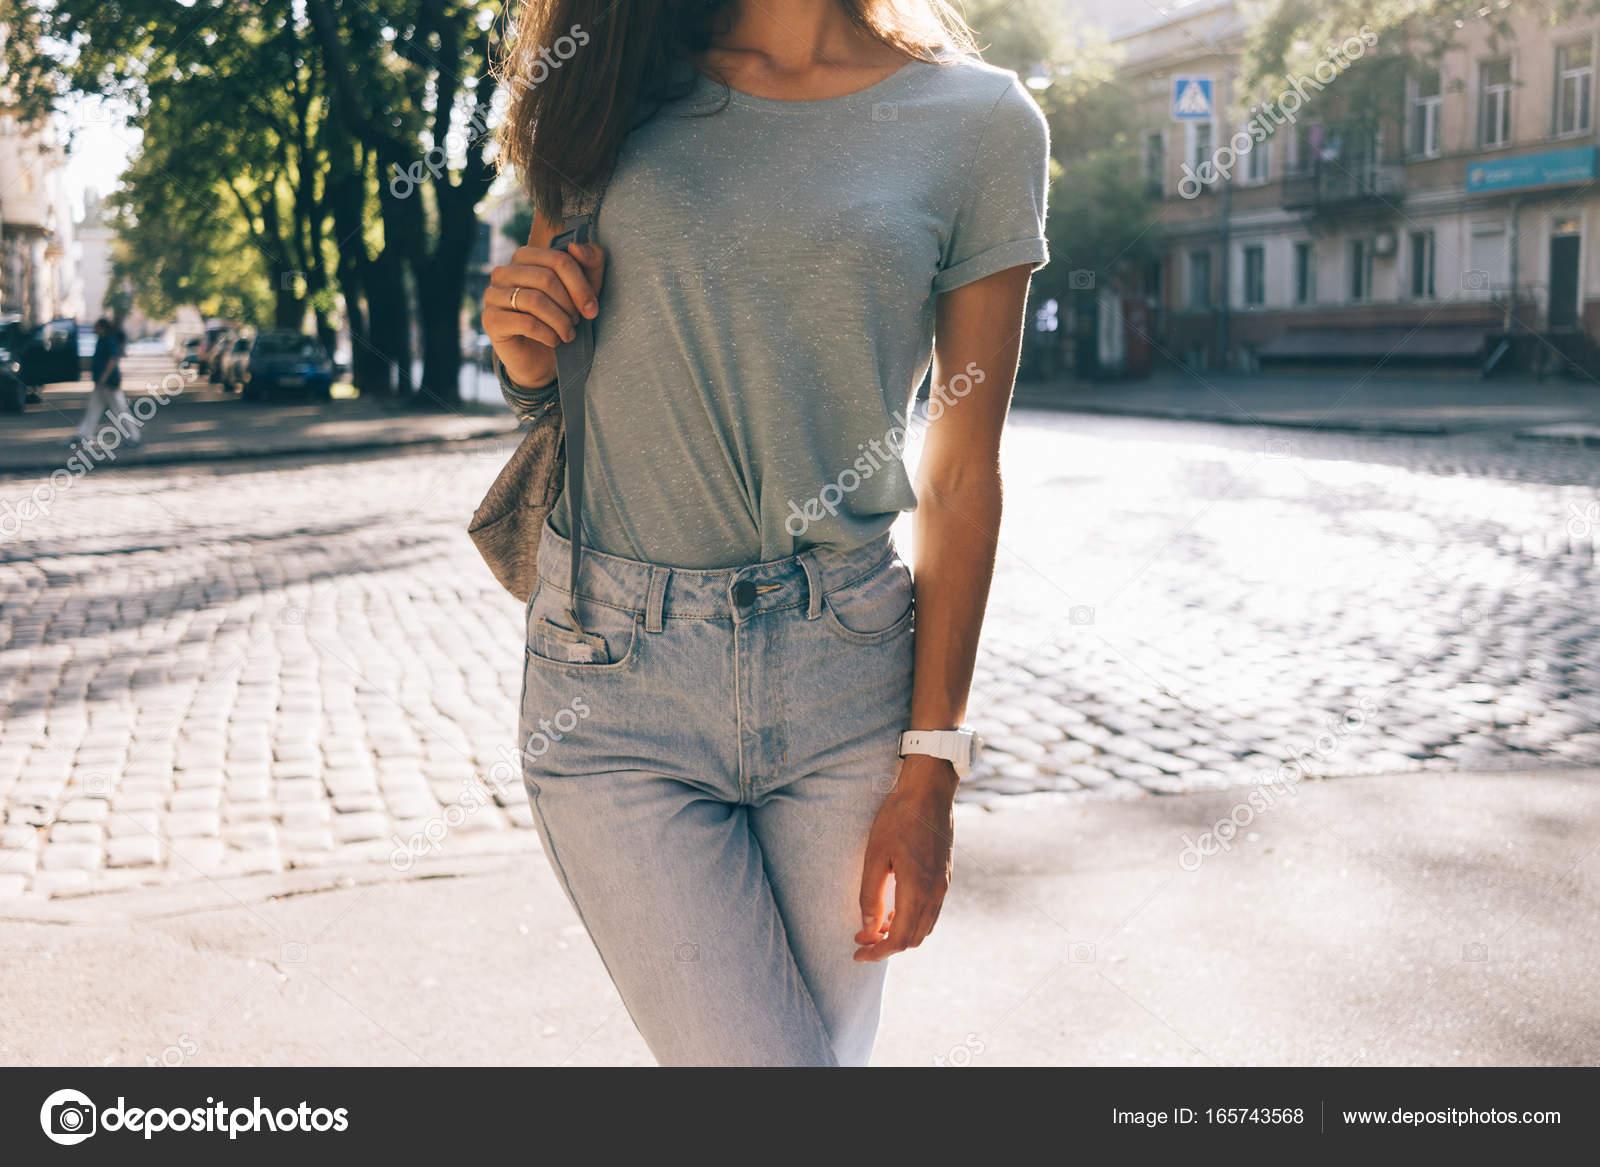 49bac938a2c1 Slim κορίτσι με τζιν και μπλουζάκια με το υπόβαθρο της πόλης το καλοκαίρι —  Εικόνα από ...